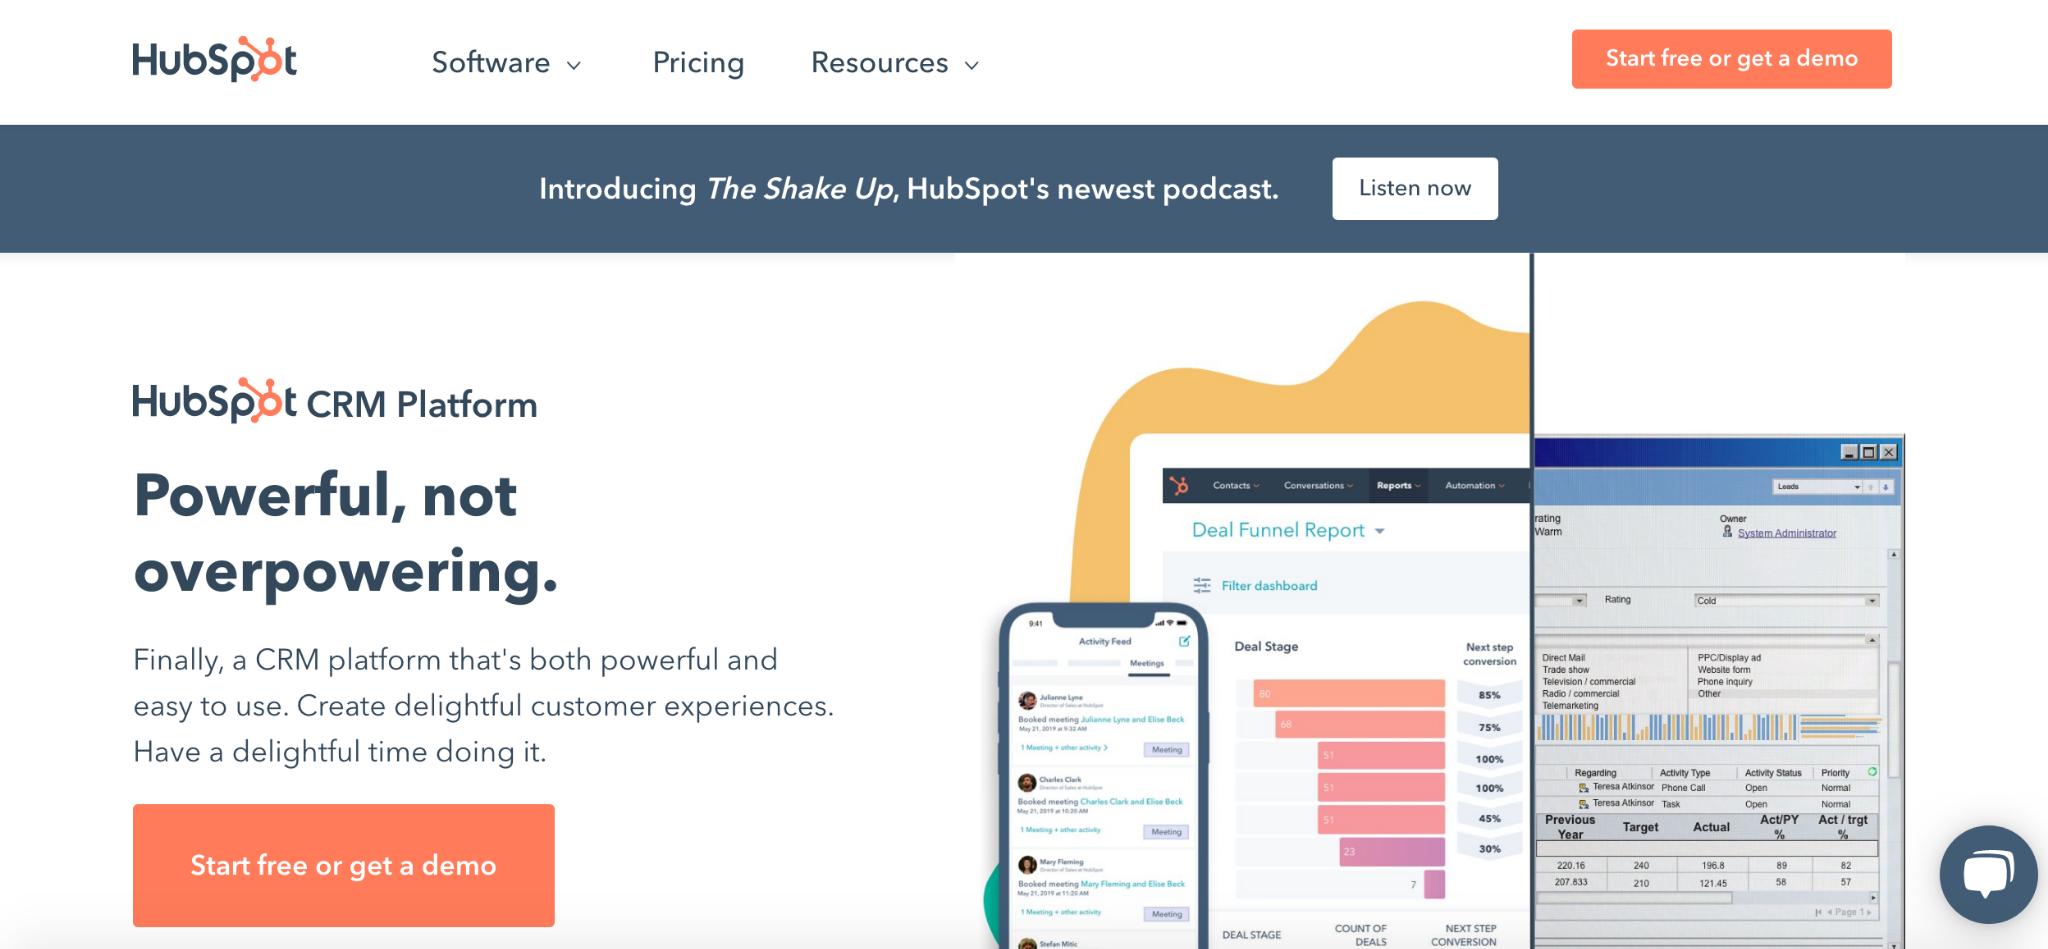 HubSpot homepage: Powerful, not overpowering.